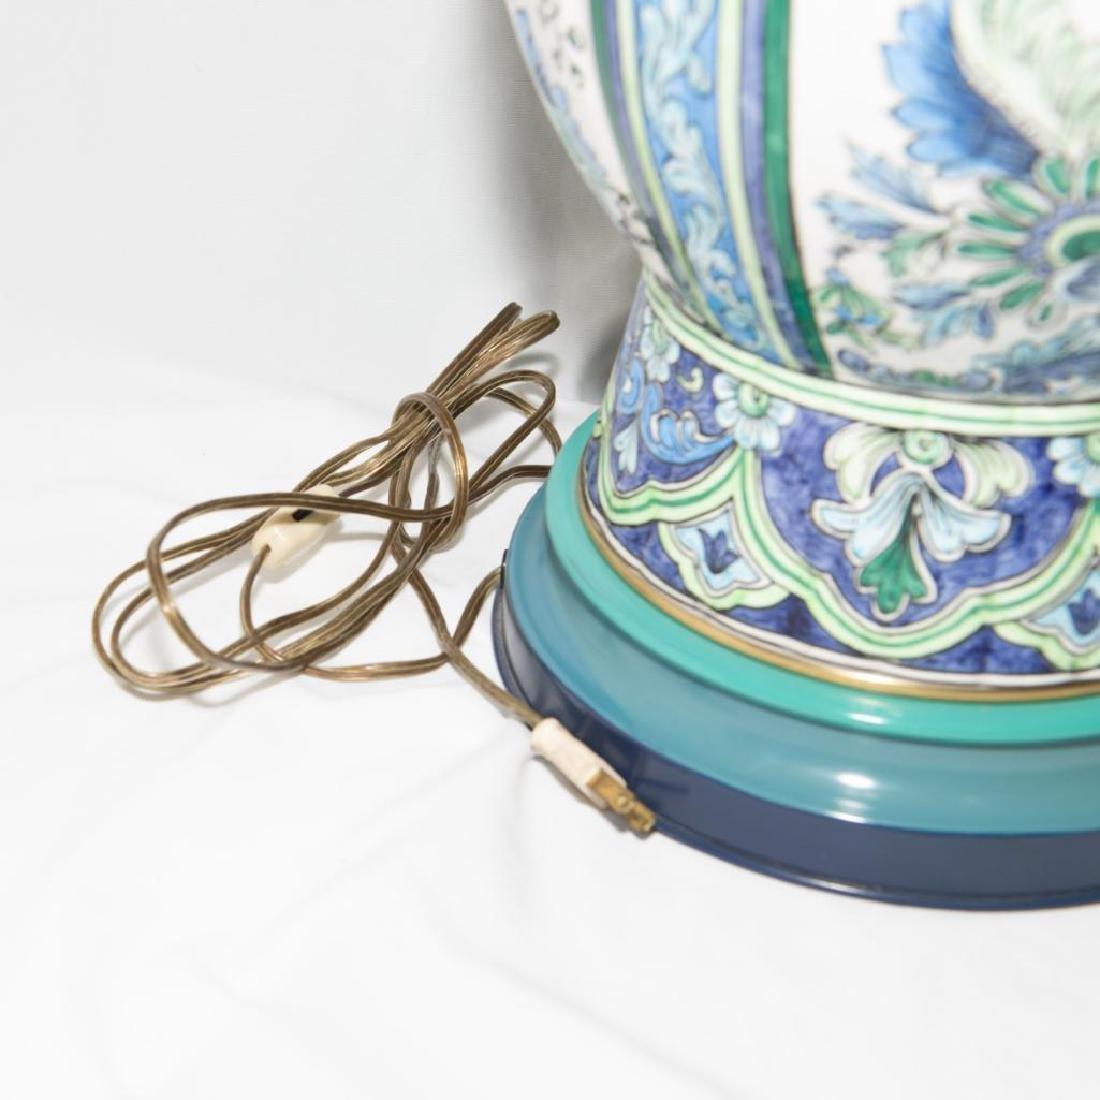 VINTAGE MARBRO CERAMIC TIN BRASS DUAL BULB DESK LAMP - 3